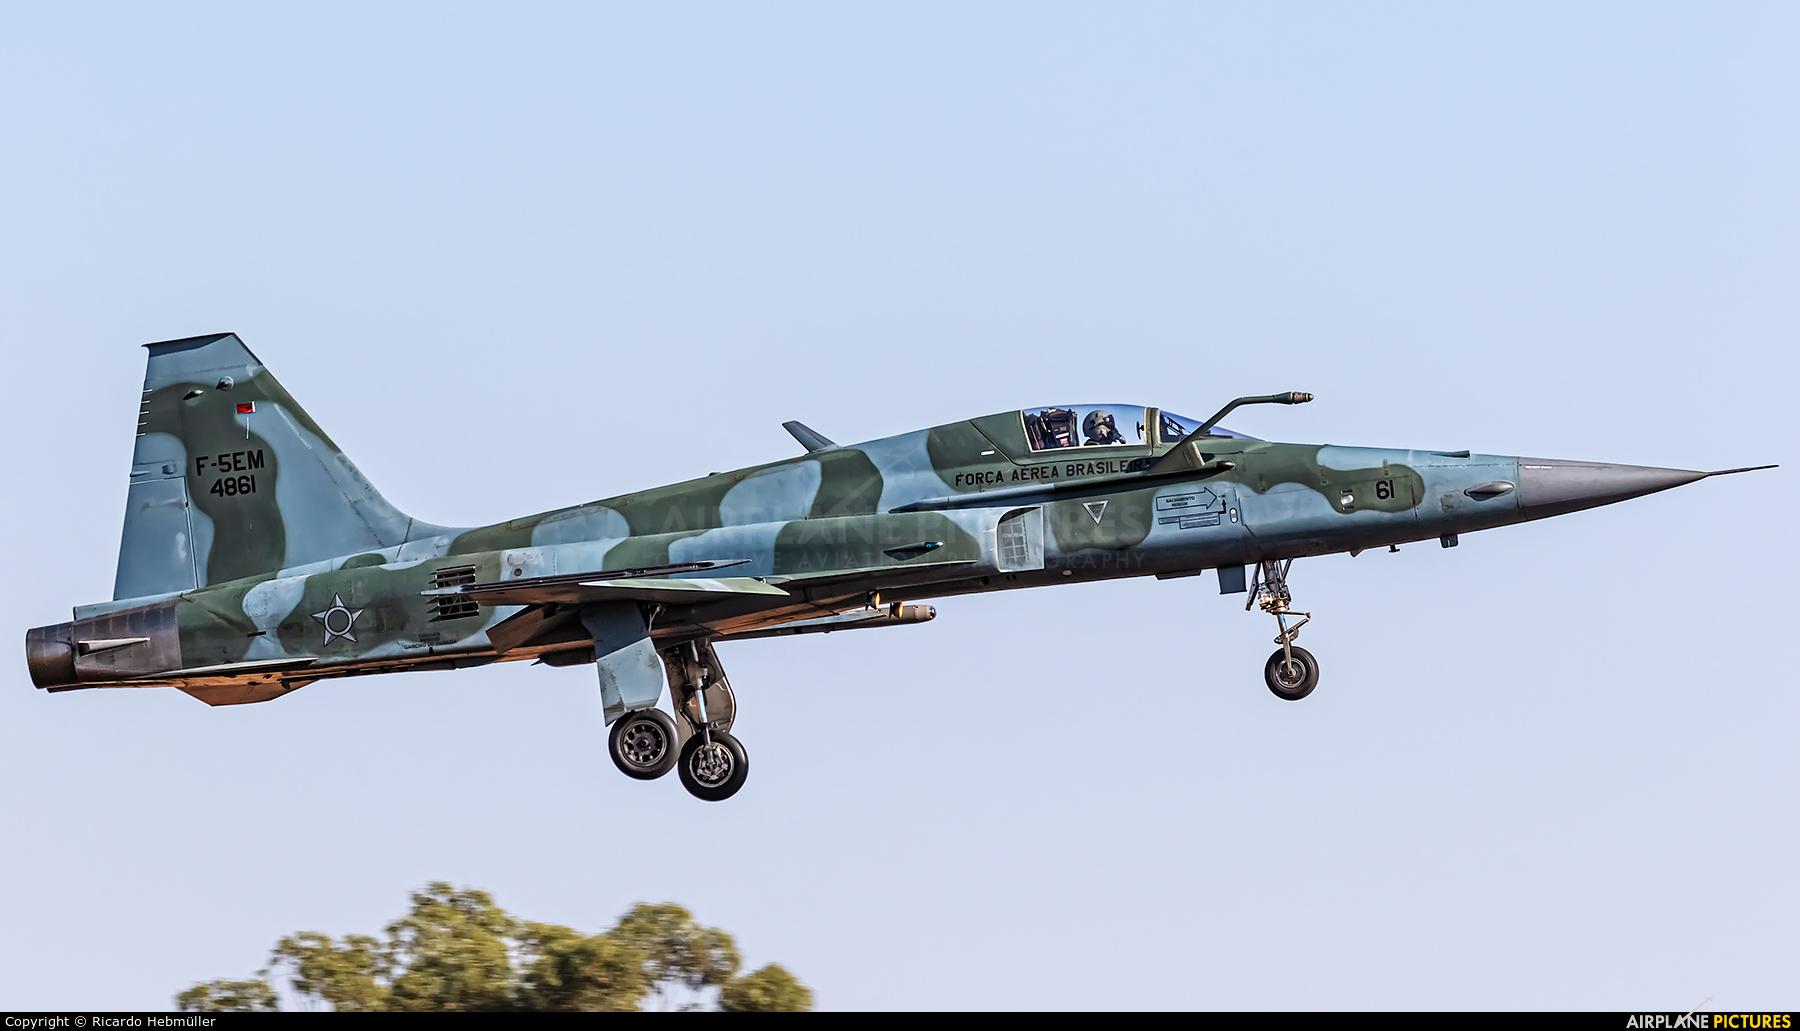 Brazil - Air Force 4861 aircraft at Anápolis AFB